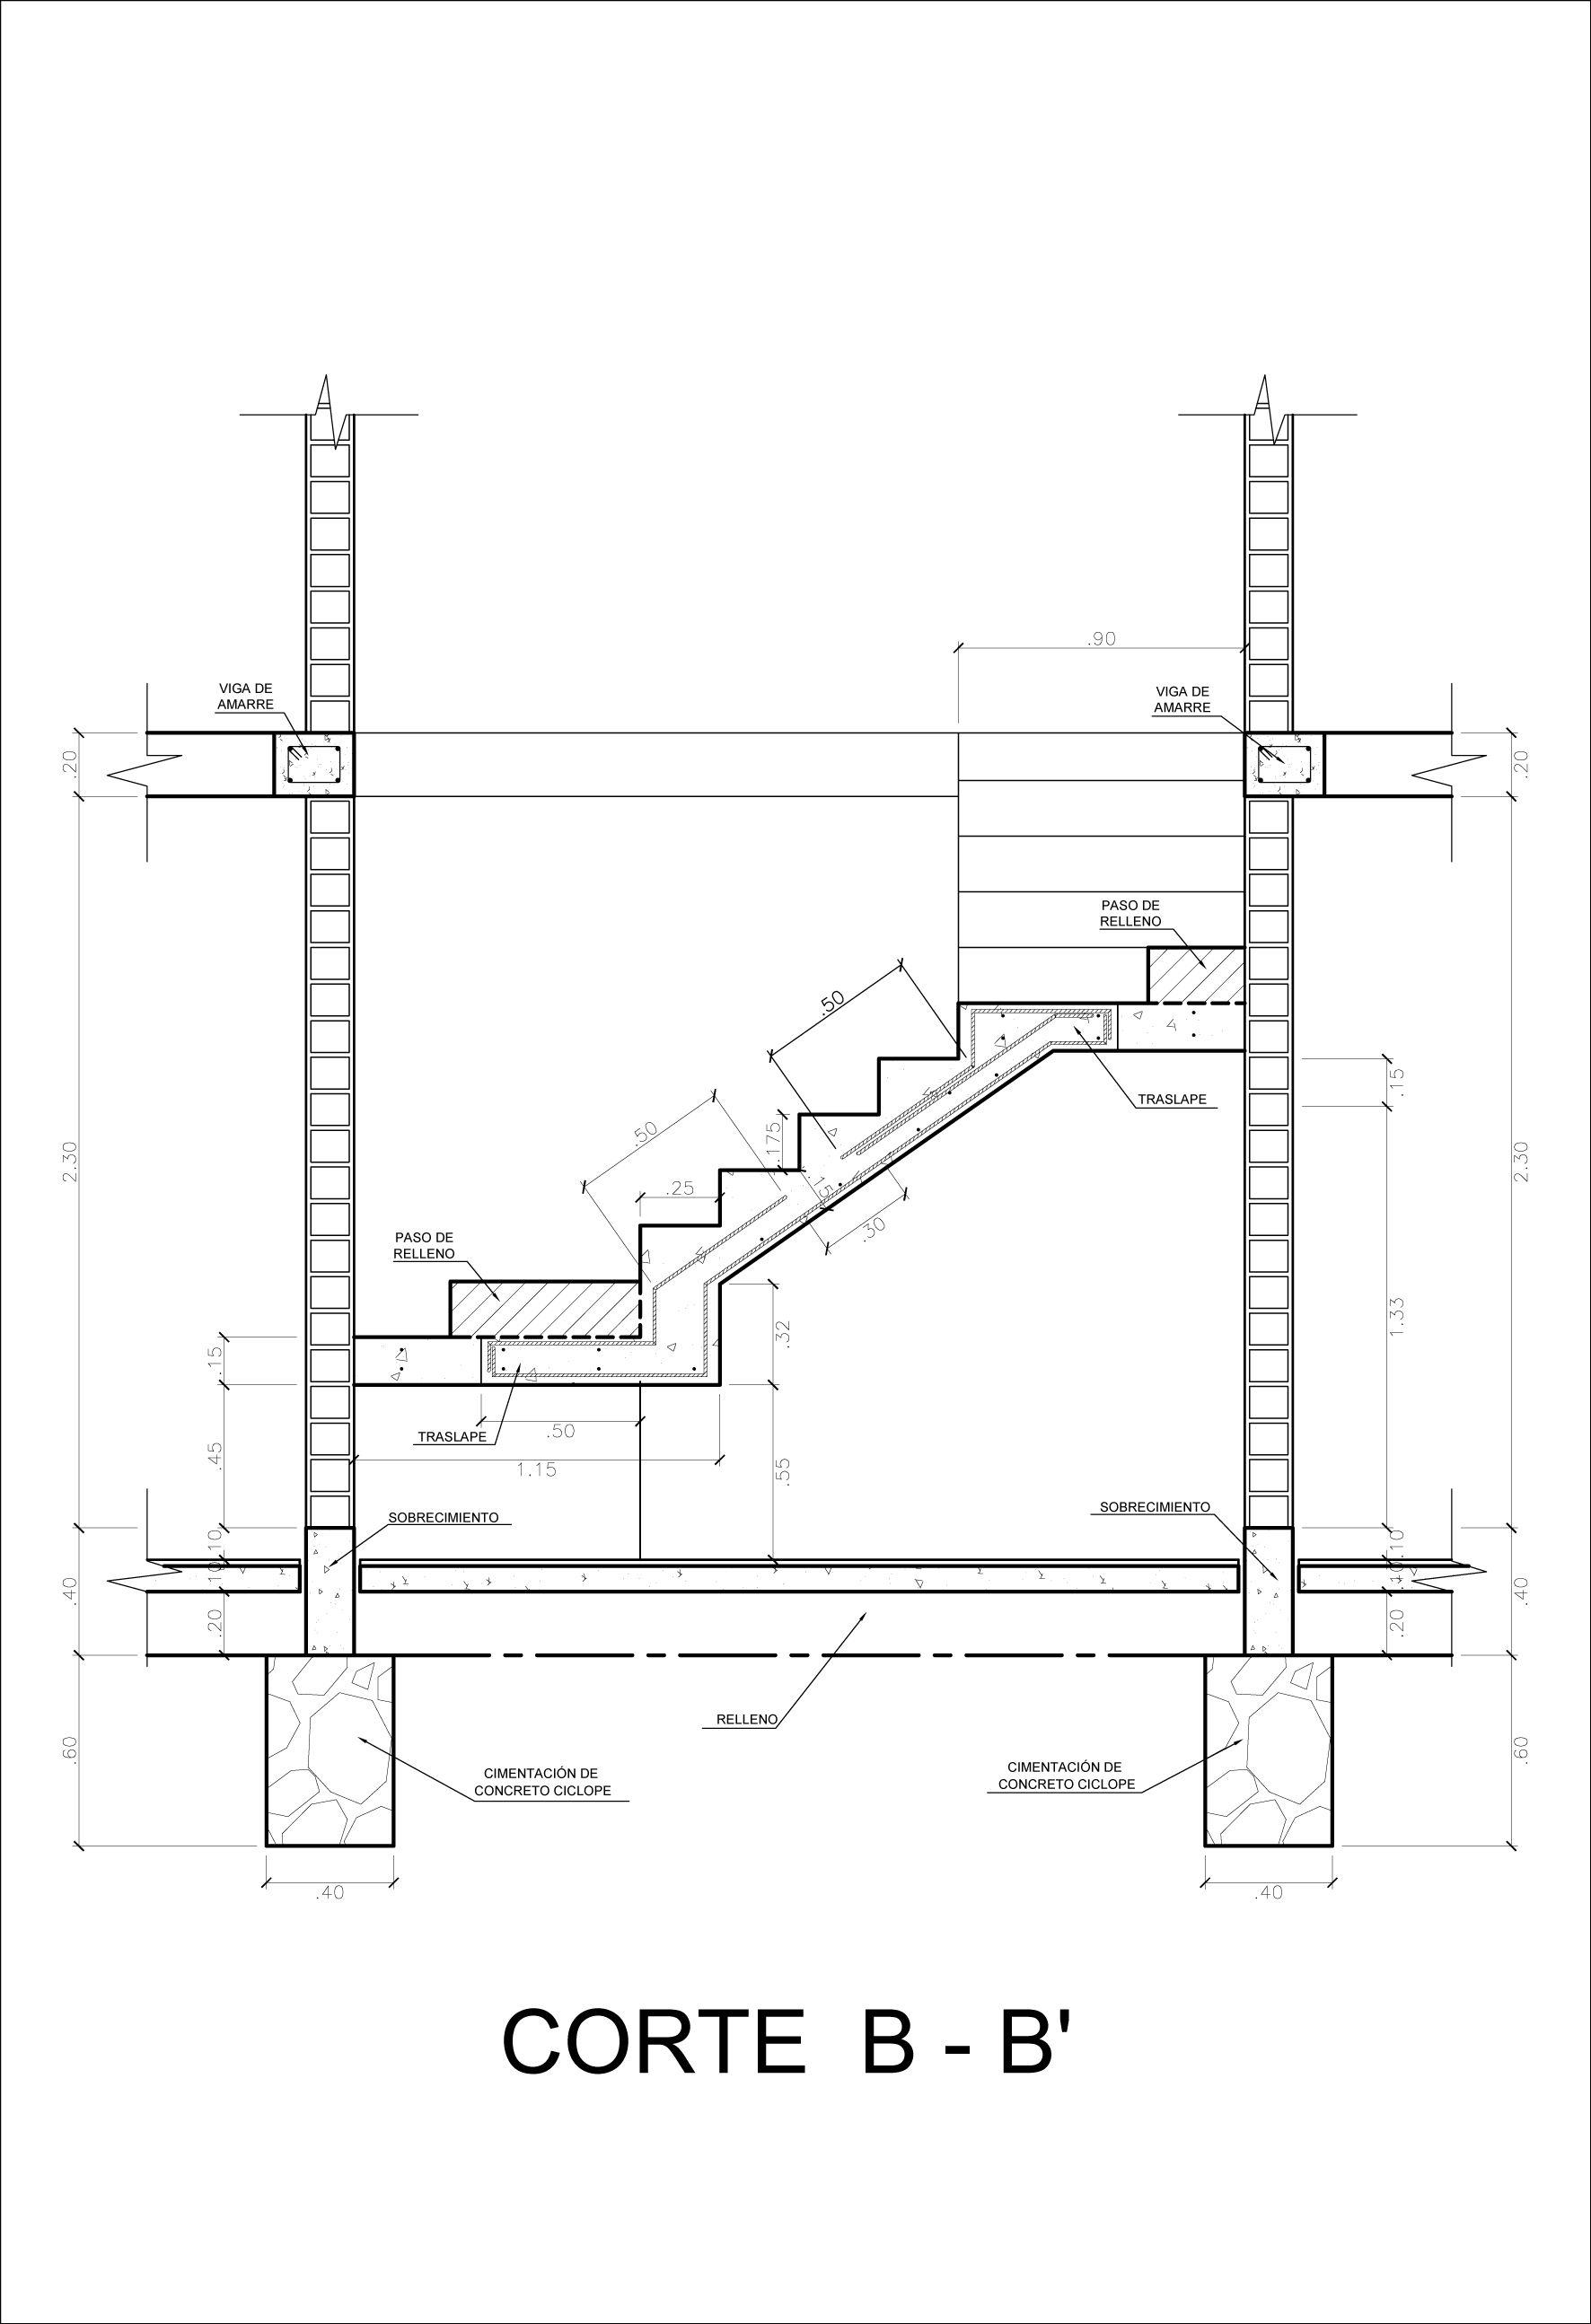 Escalera Detalle De Construccion Detalles Constructivos Constructivo Escalera